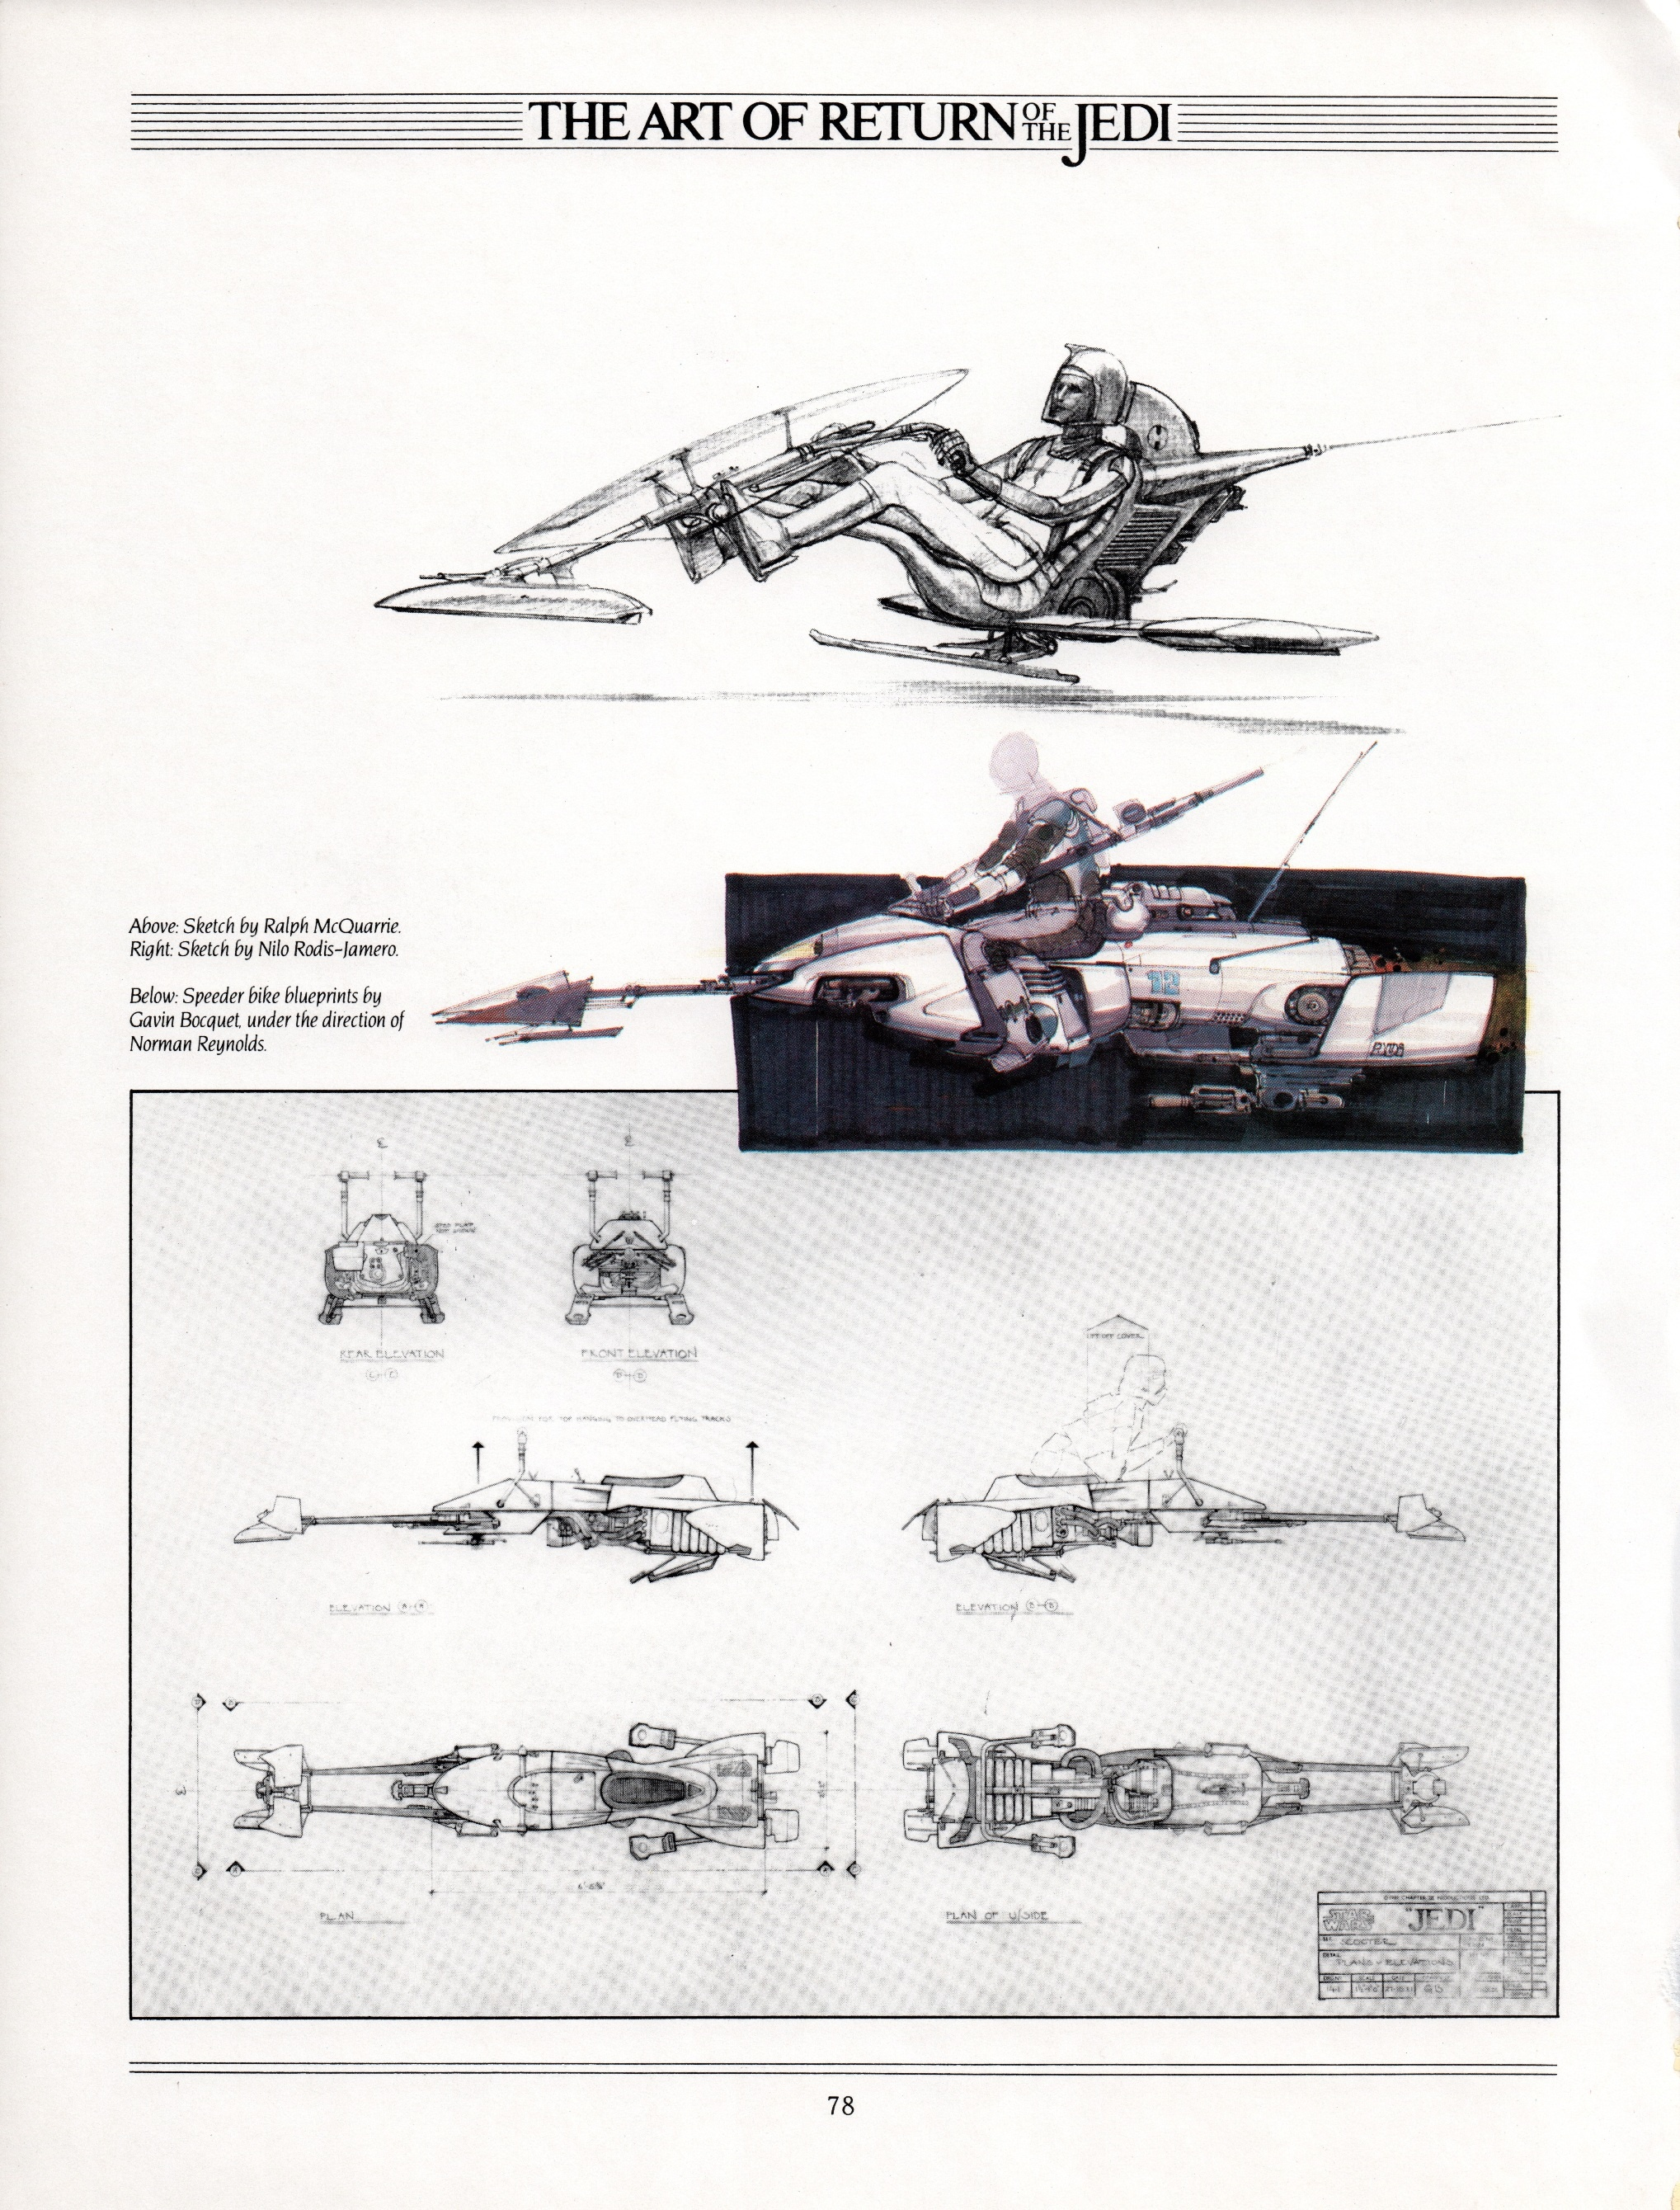 Art of Return of the Jedi (b0bafett_Empire)-p078